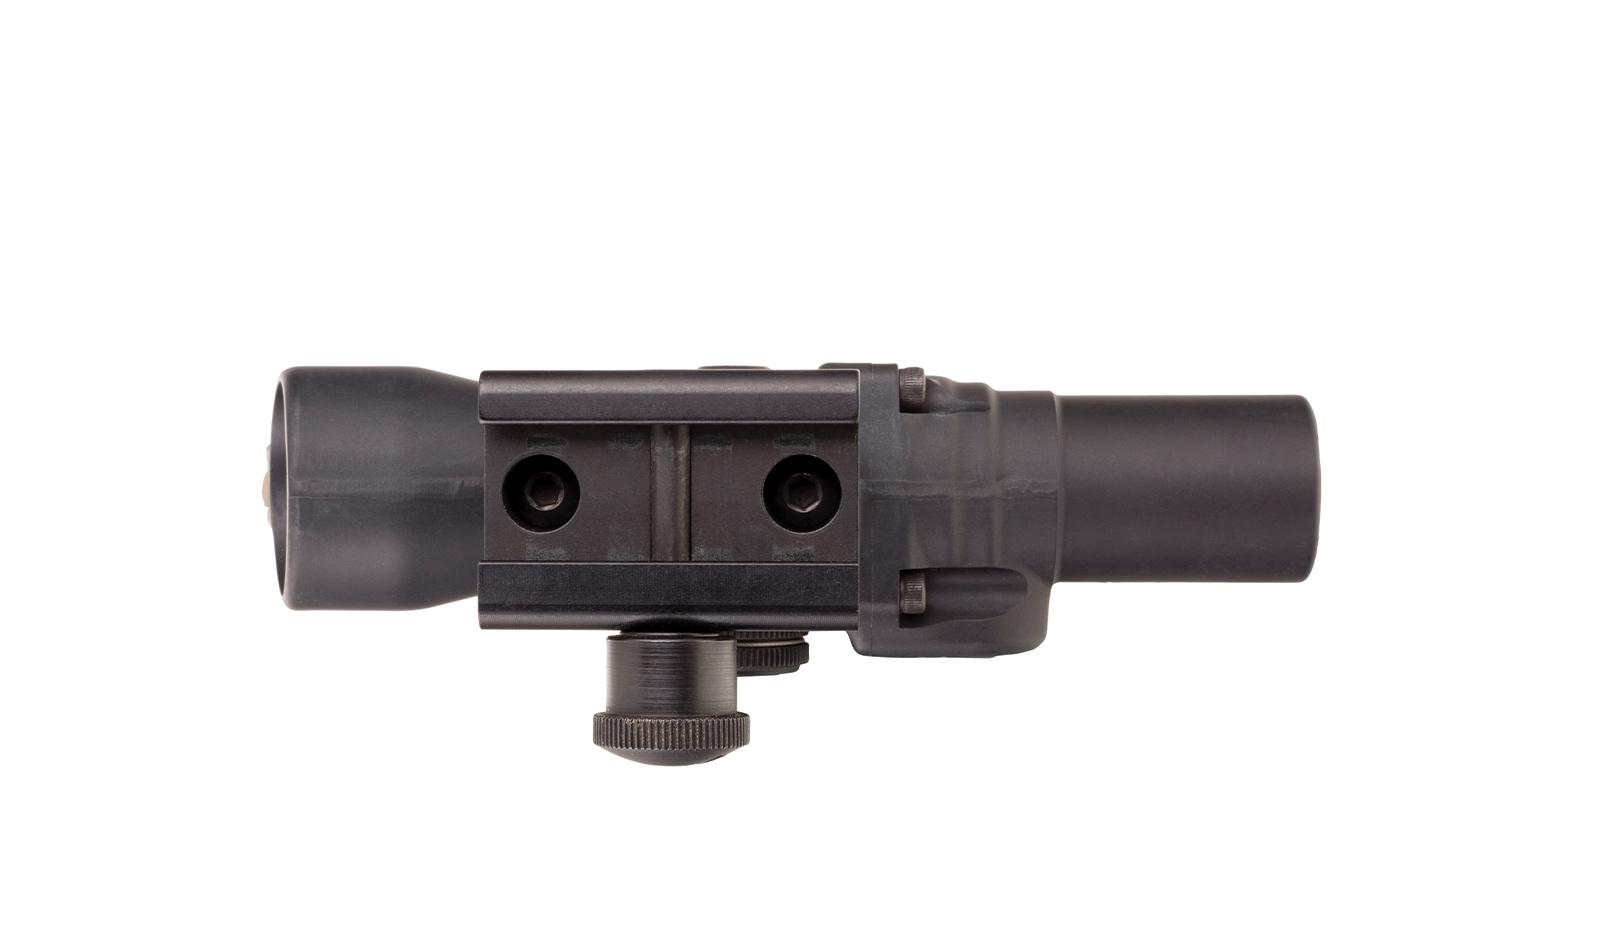 TA45-C-400153 angle 9